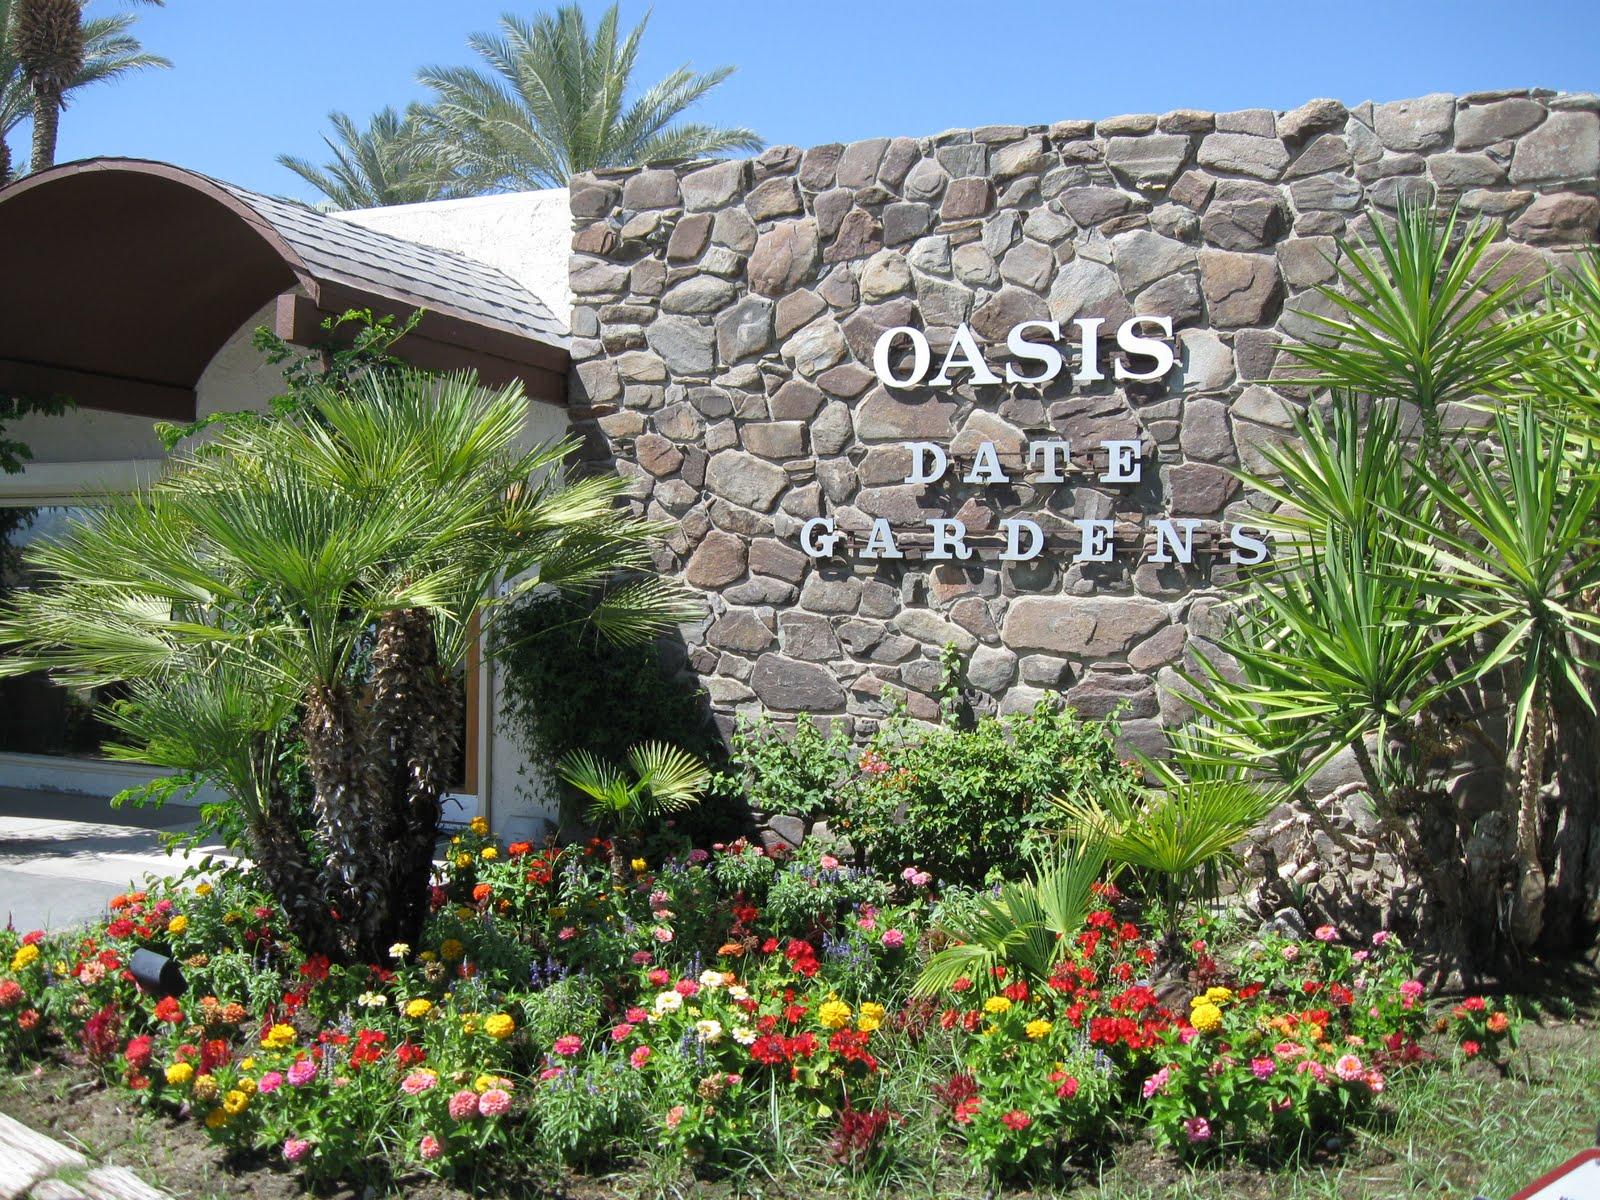 from Dash dating gardening